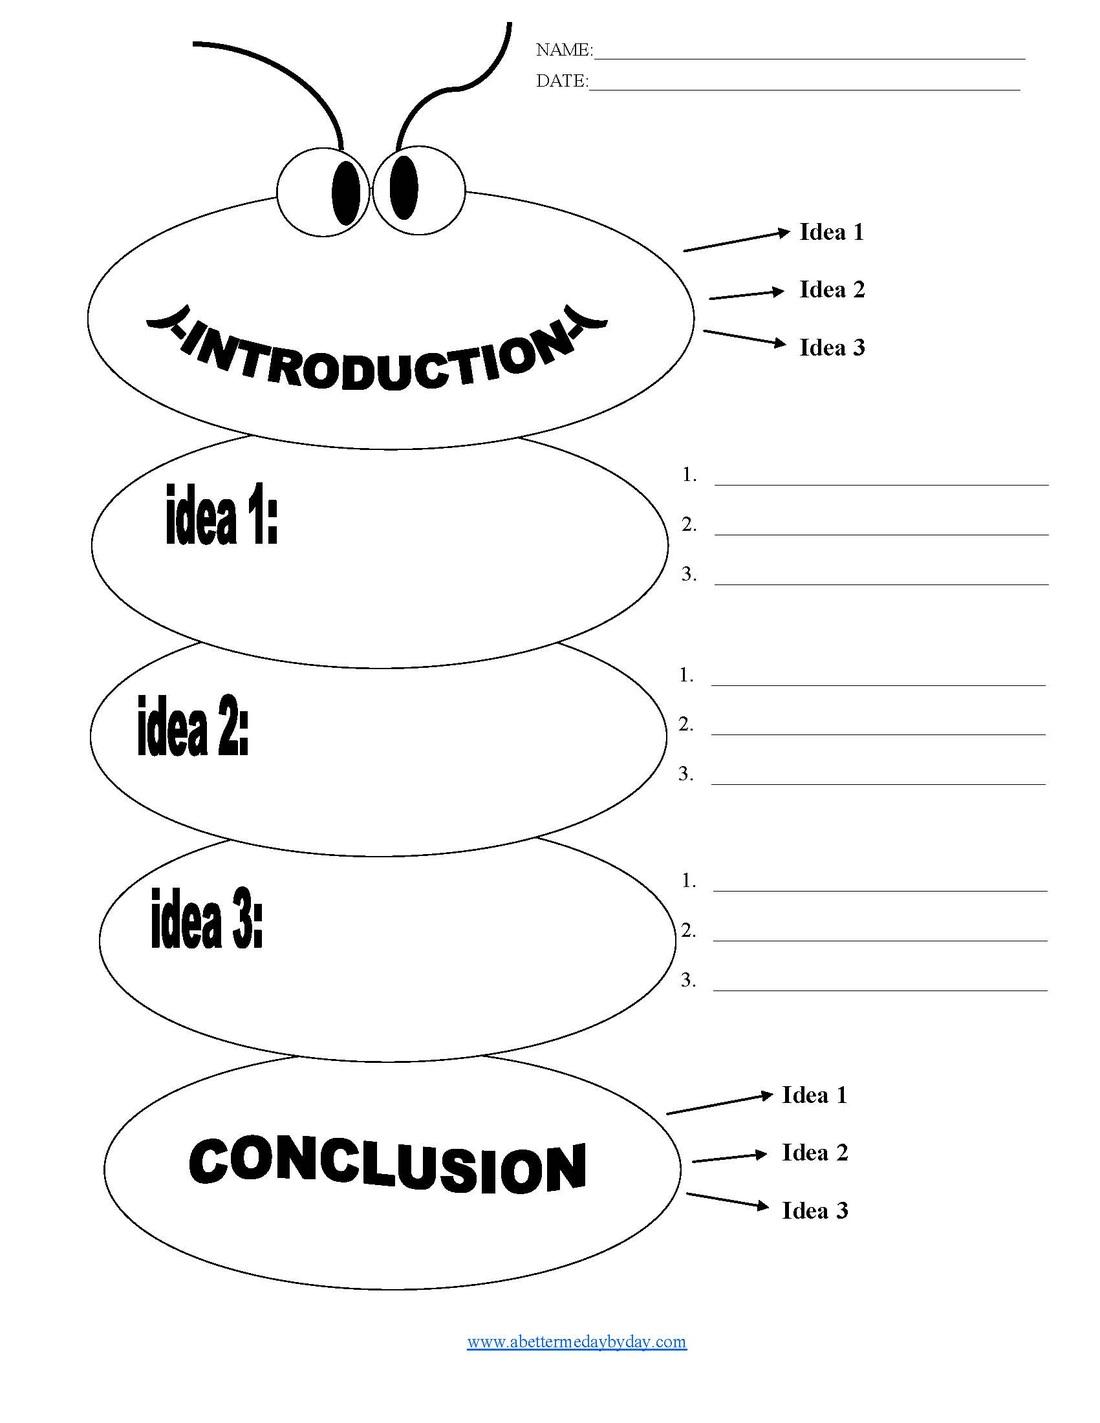 simple bubble diagram for writing kazuma 50 atv wiring outline genetics and evolution essay webquest